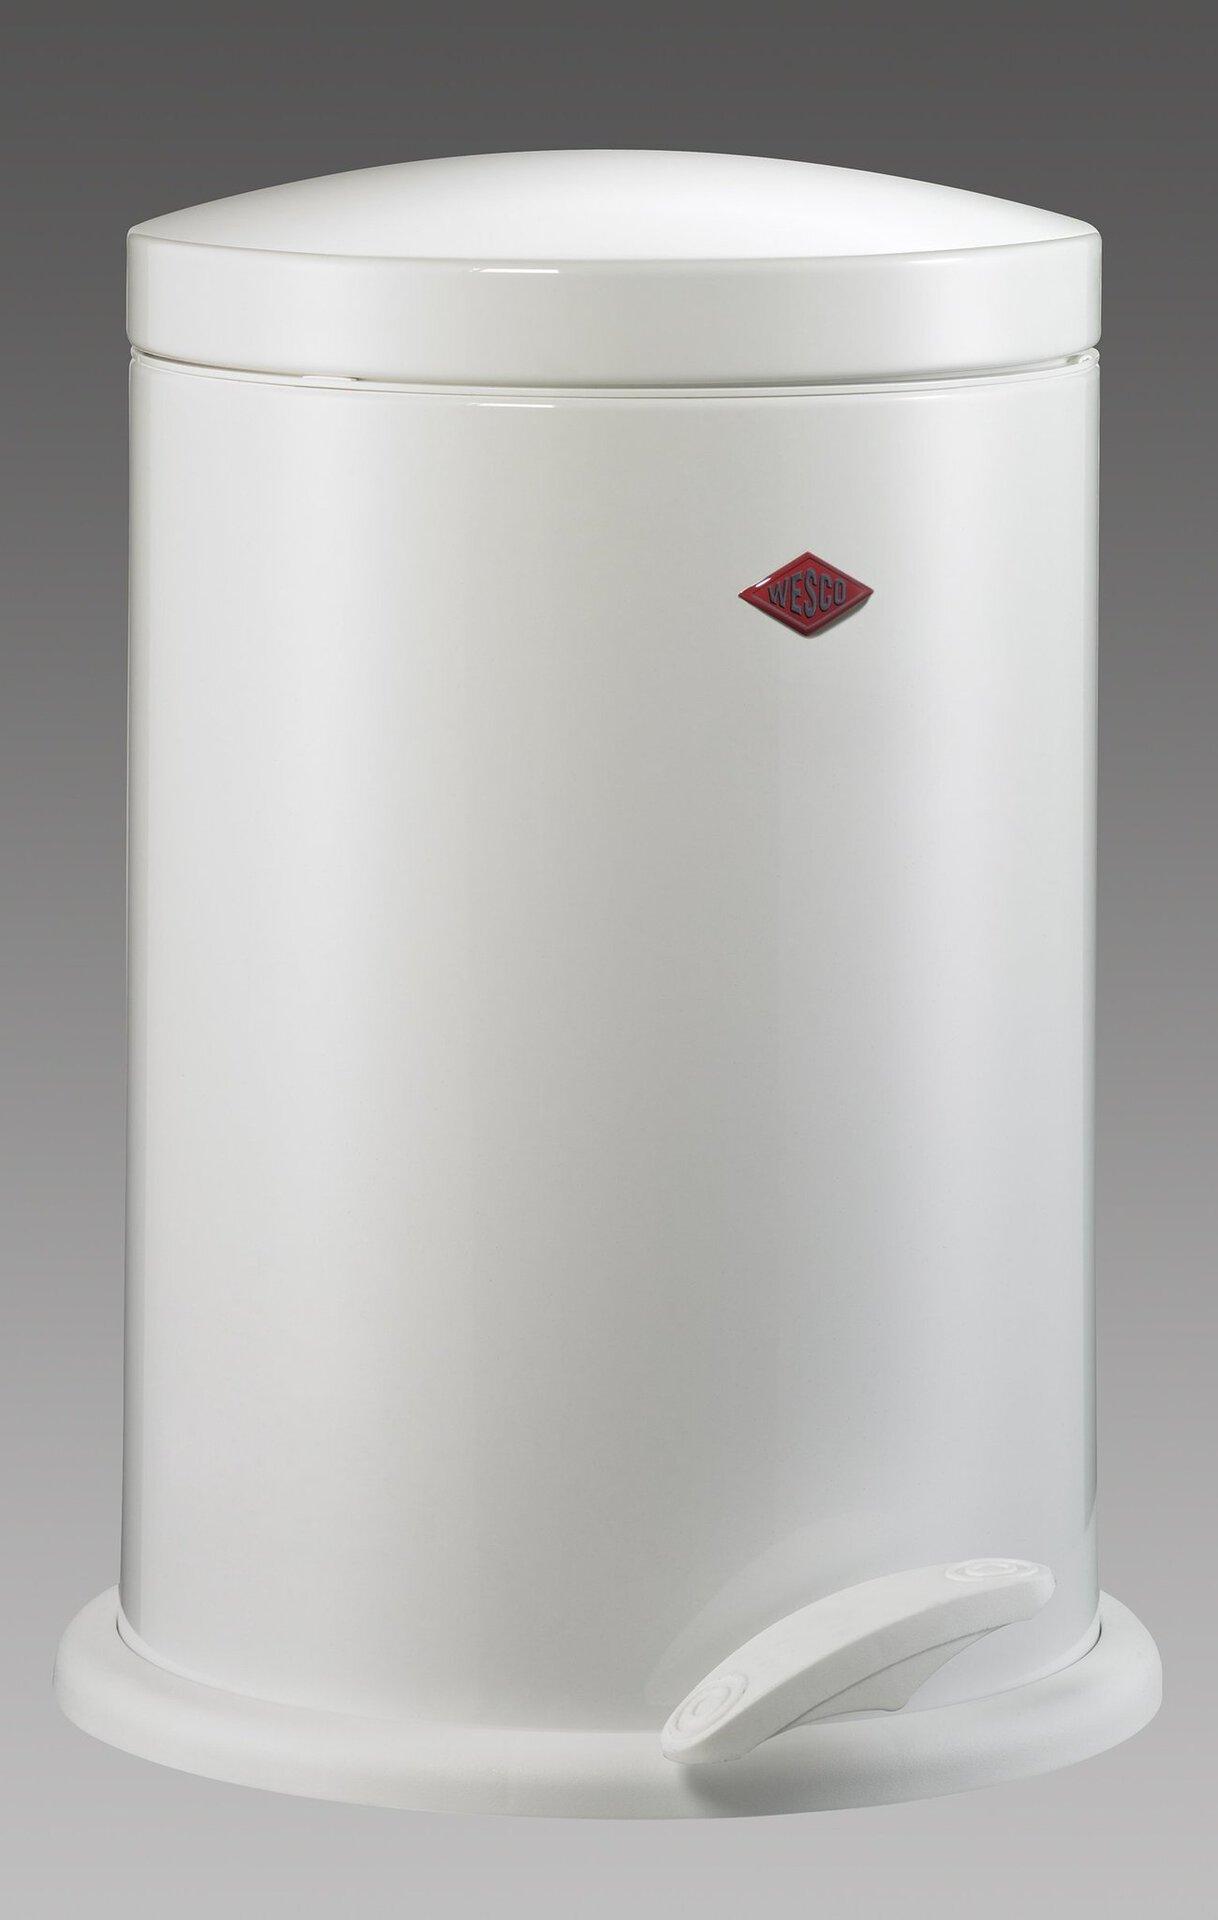 Müllbehälter Base Wesco Metall weiß